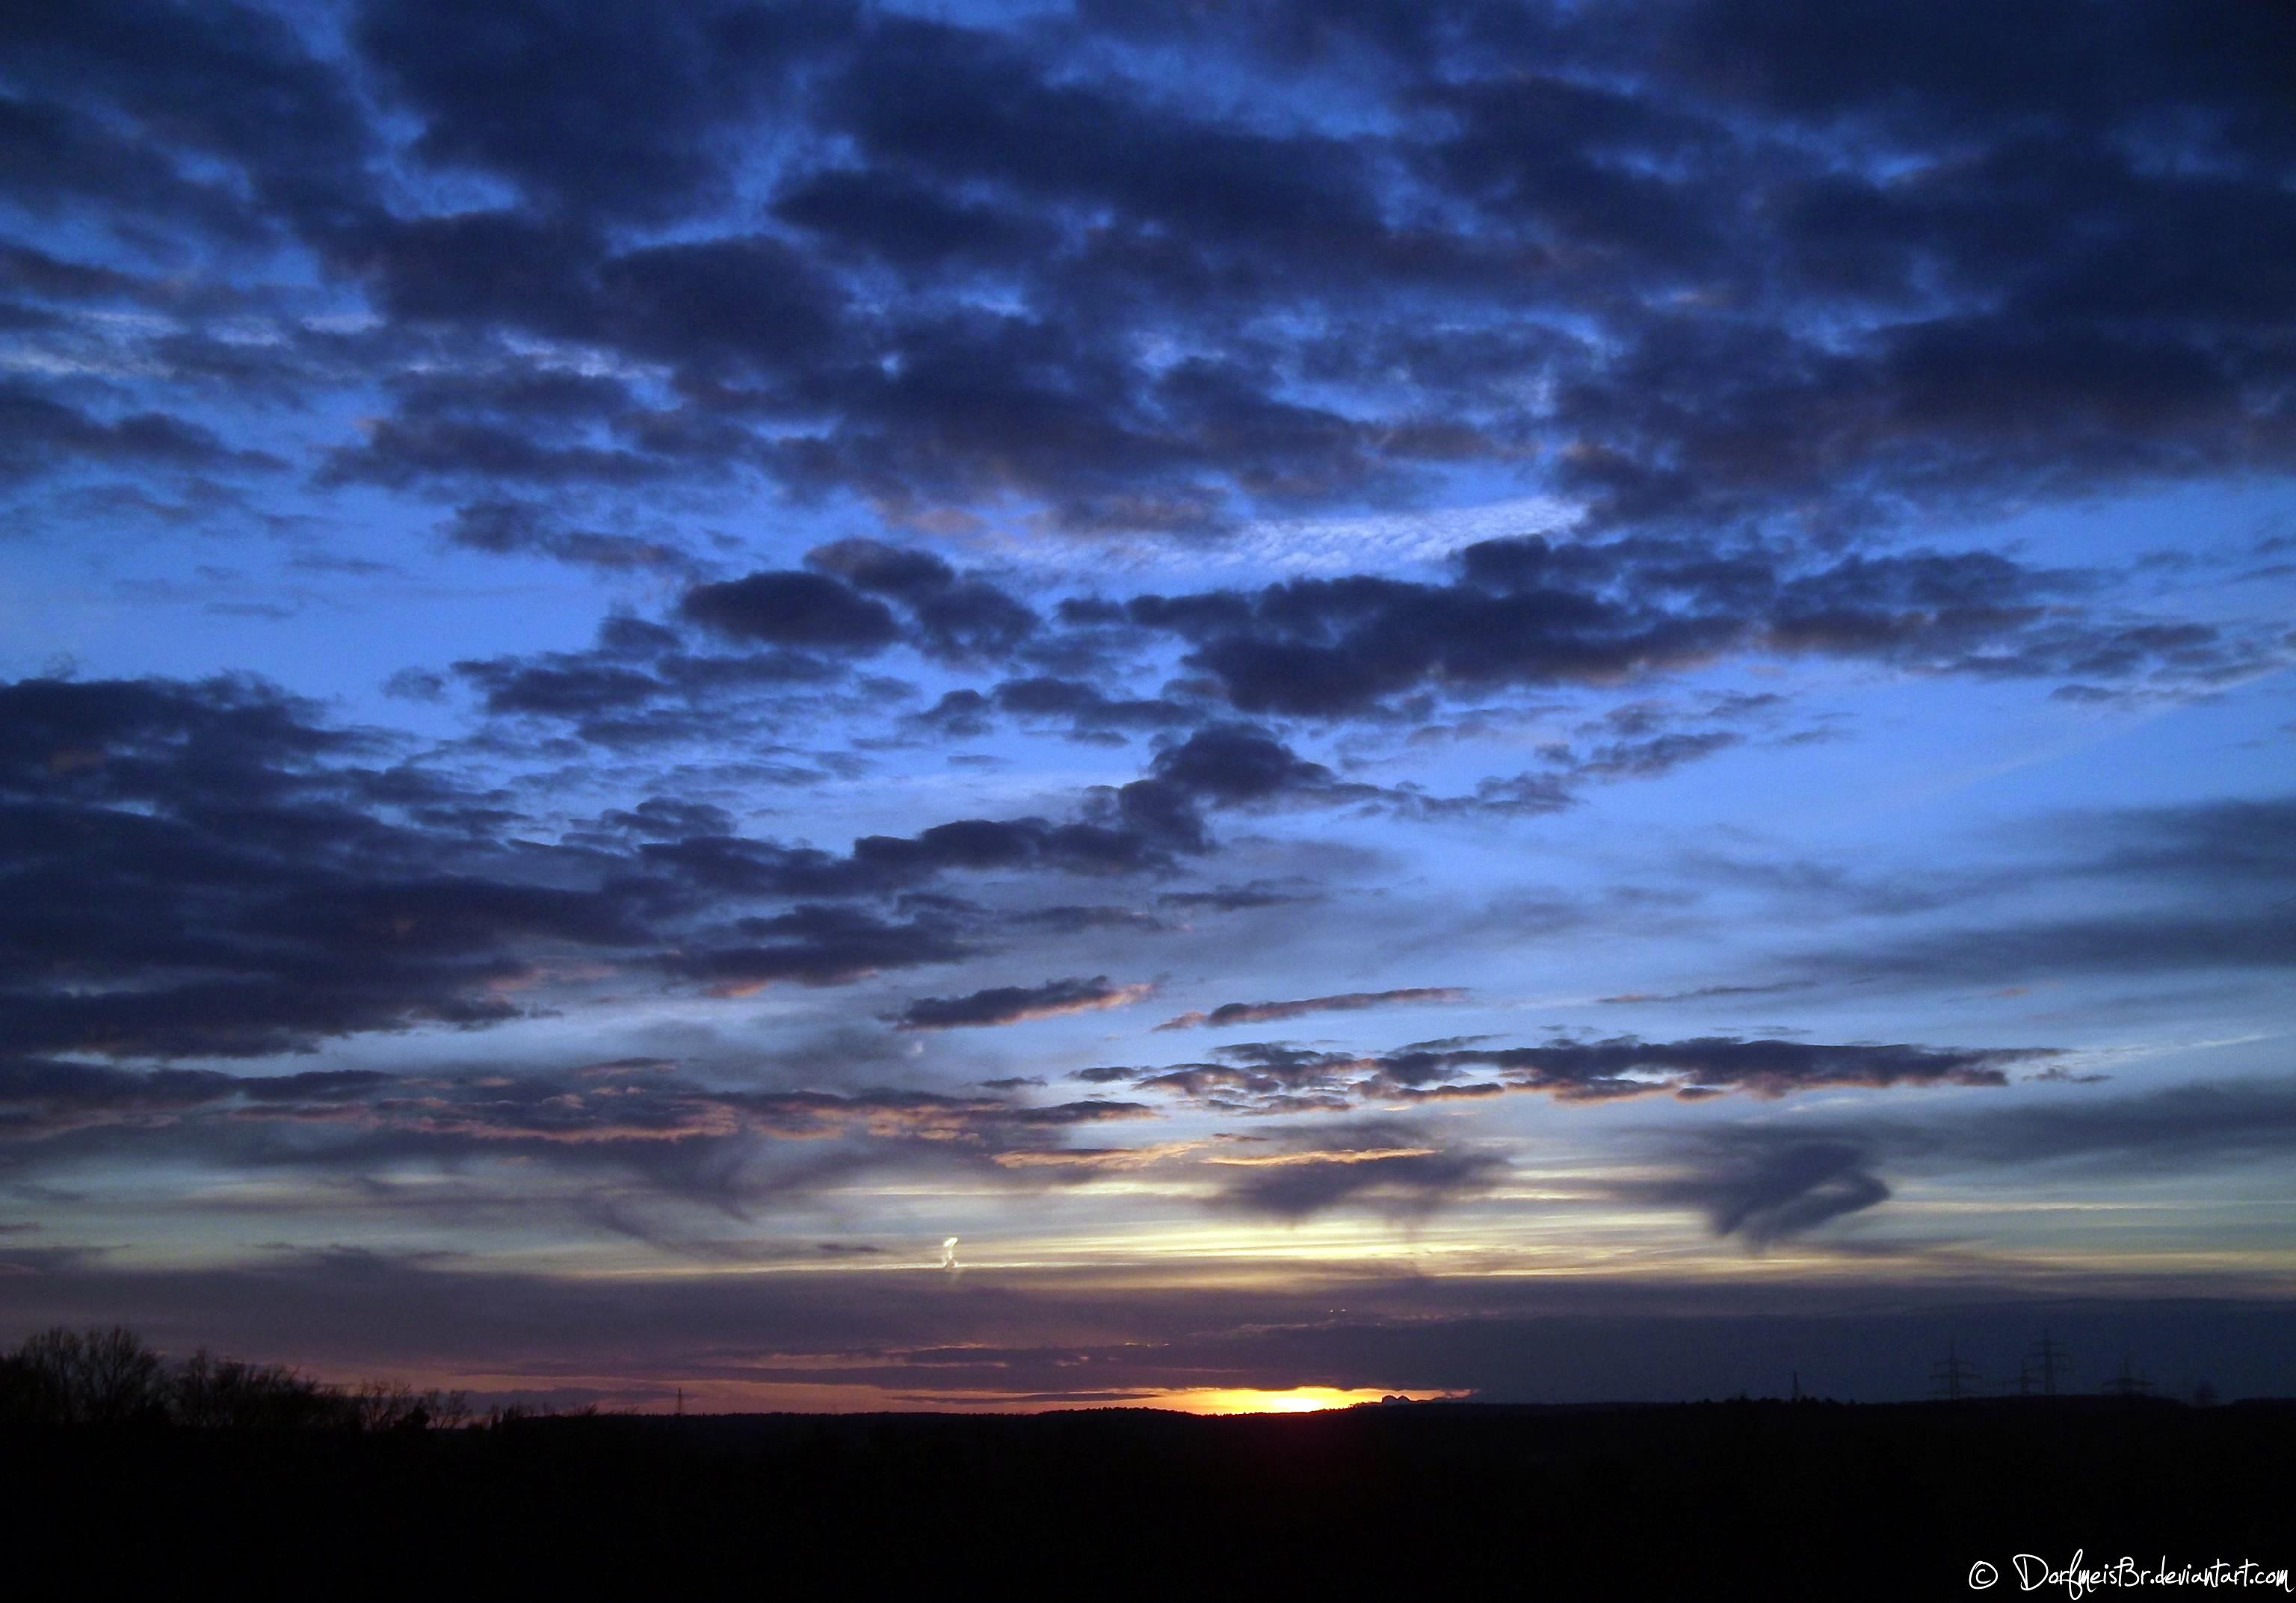 beautiful Sky by Dorfmeist3r on DeviantArt